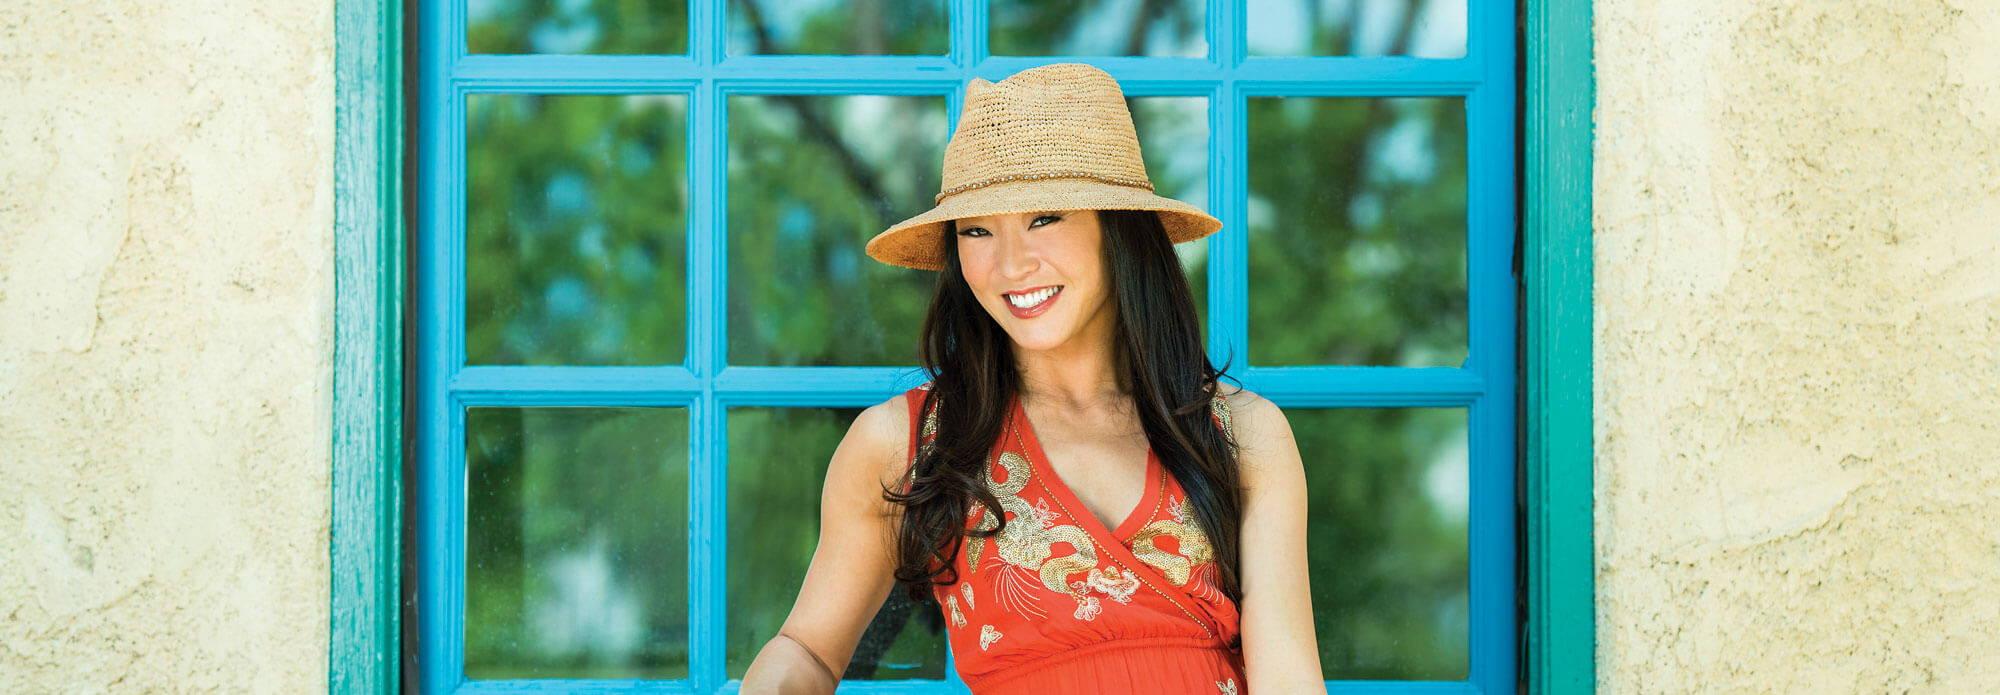 Asian woman wearing sun hat smiling